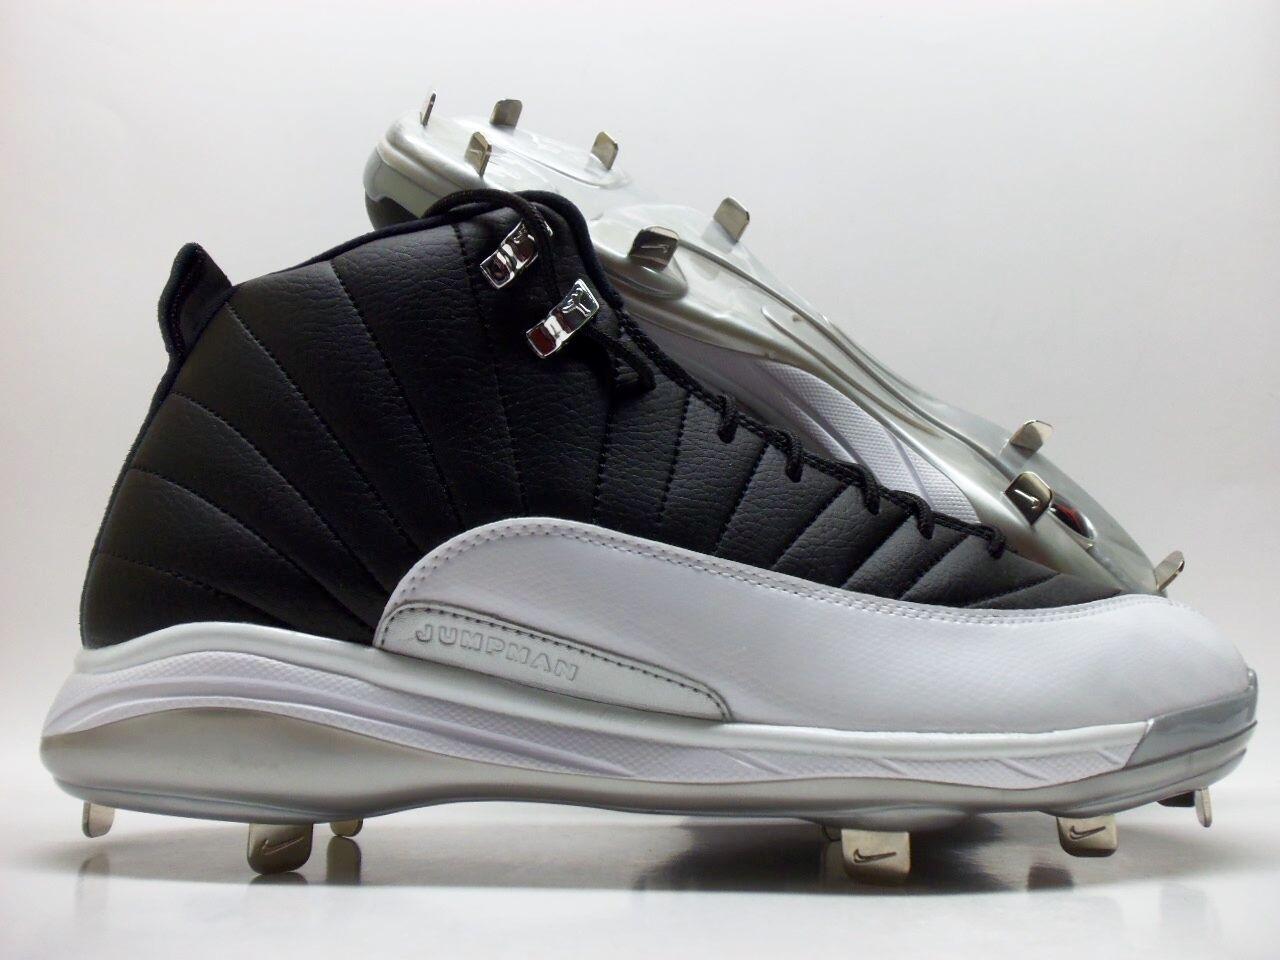 Nike Air Jordan 12 talla Retro Metal Baseball negro / blanco talla 12 16 de reducción de precios salvajes hombres zapatos casuales 44e0fe